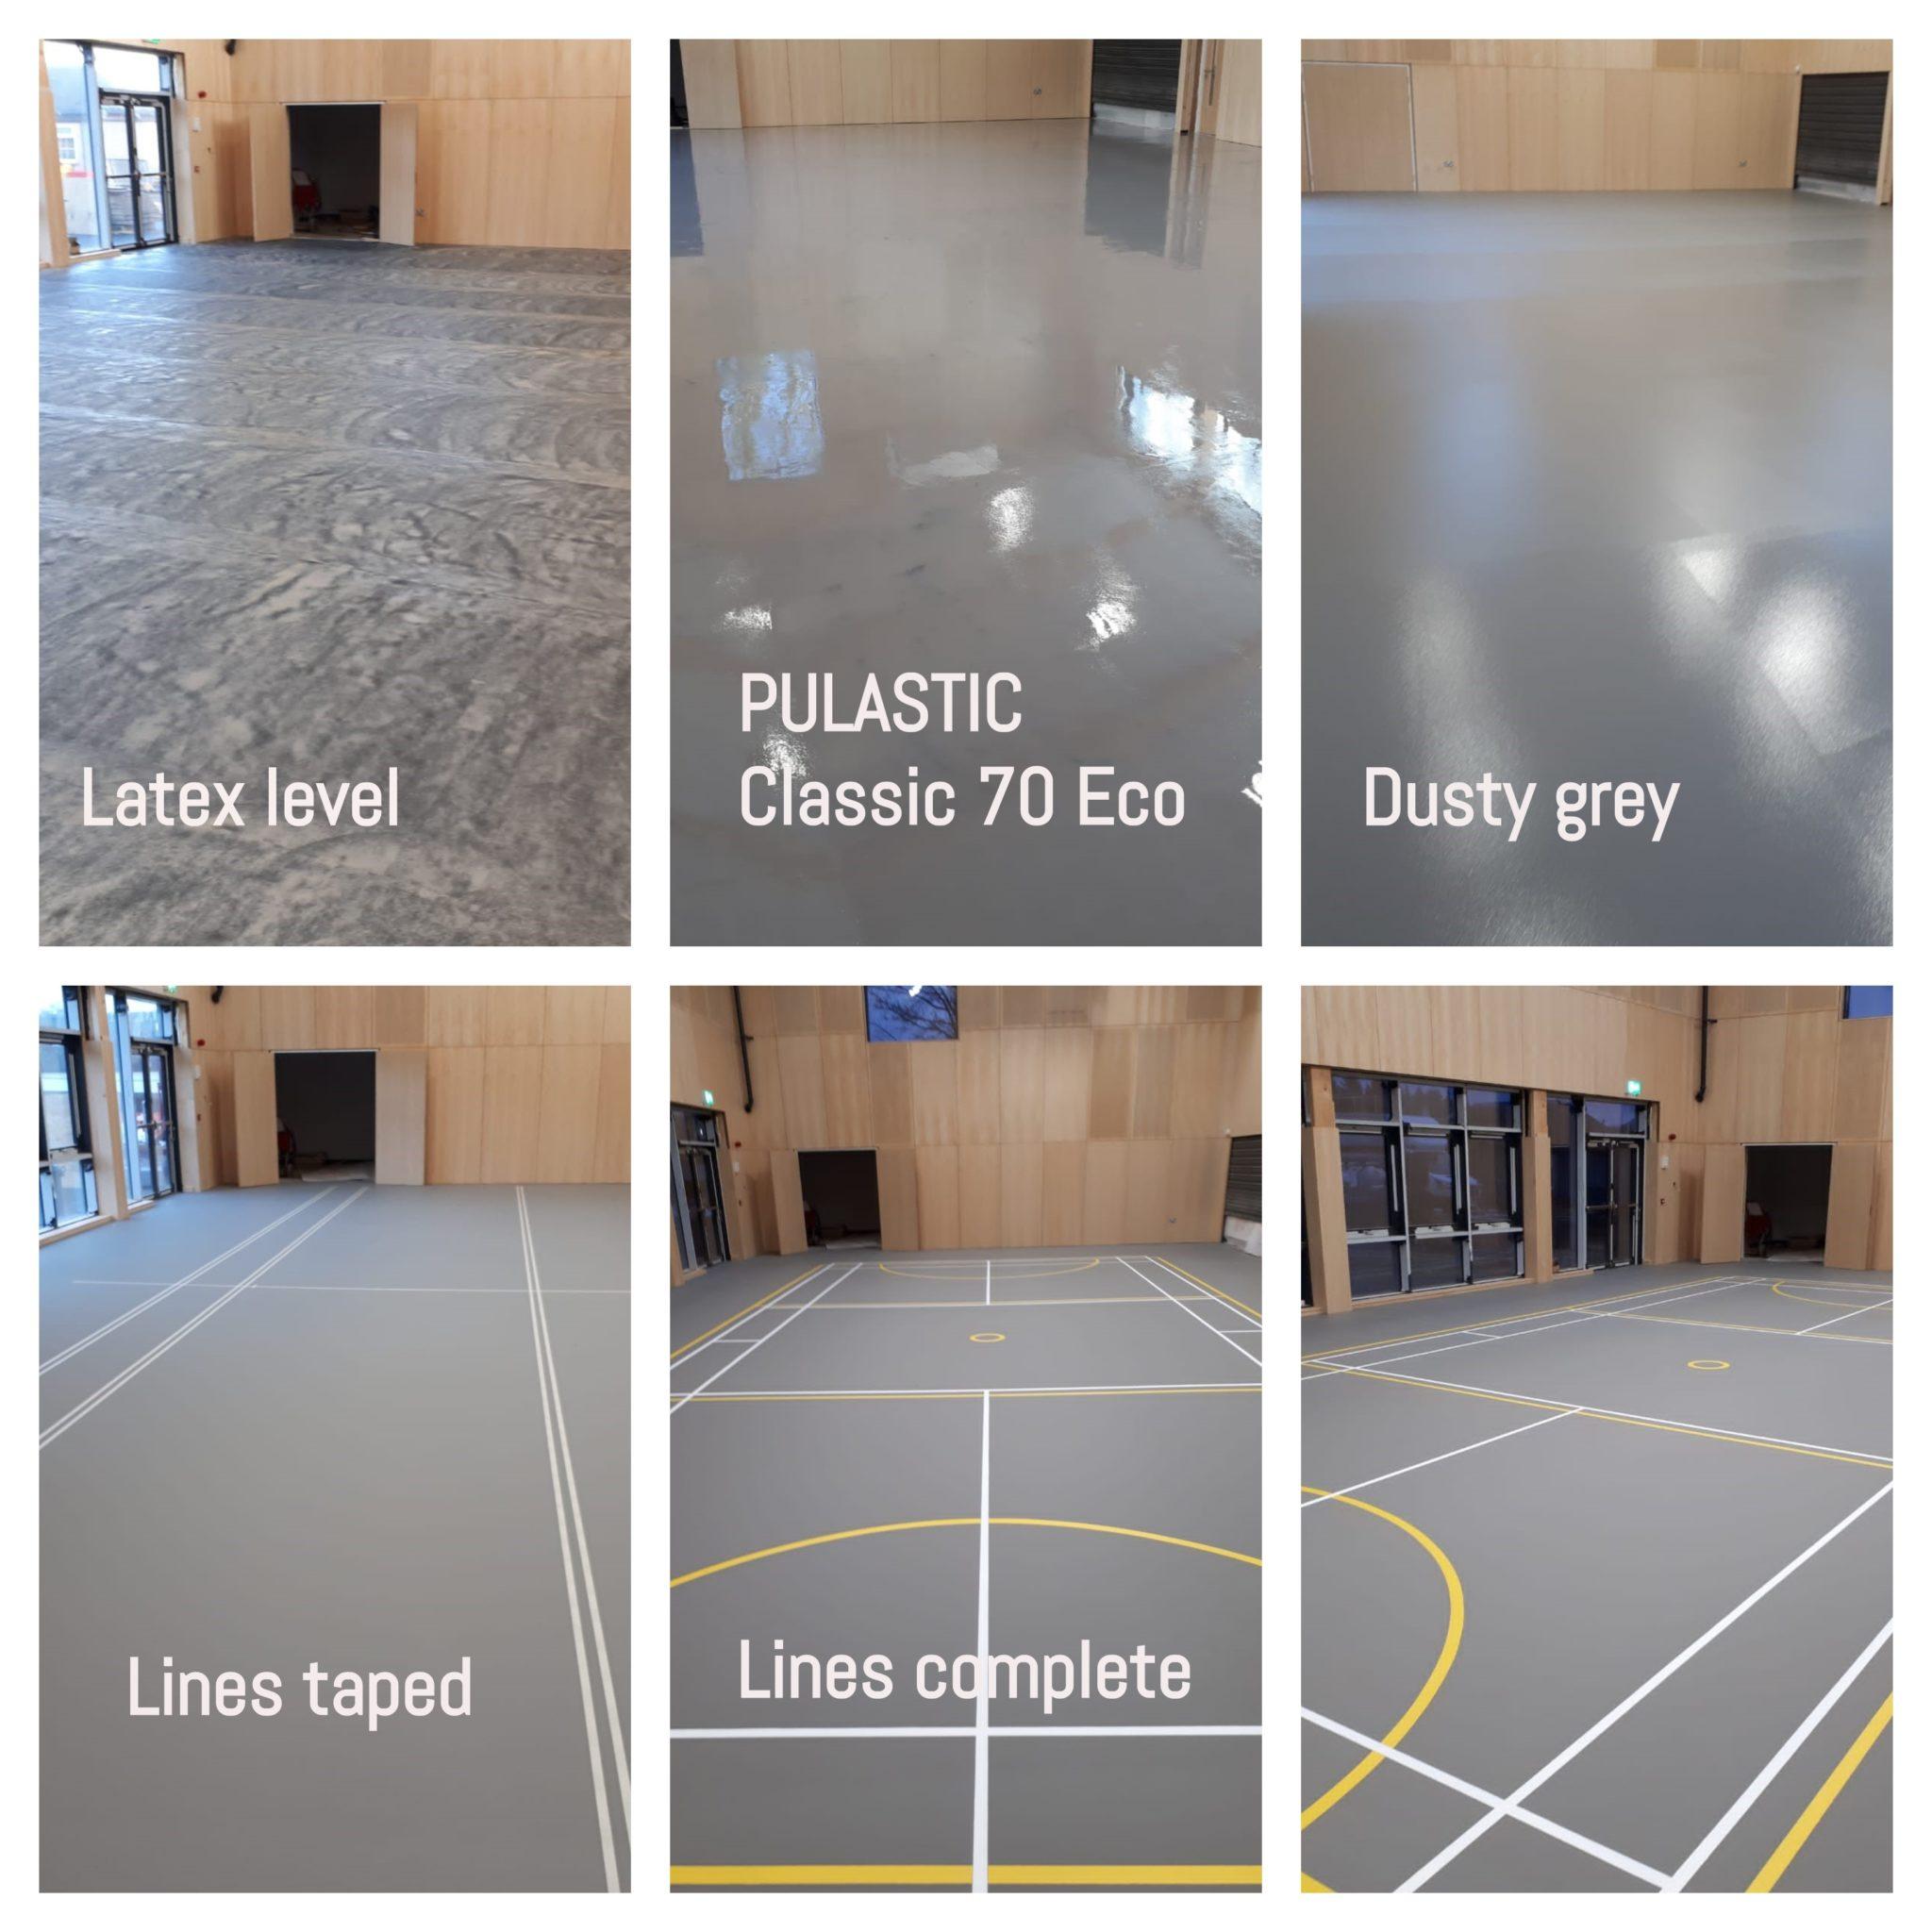 Longforgan Primary School brand new Pulastic Eco 70 Sports Floor.